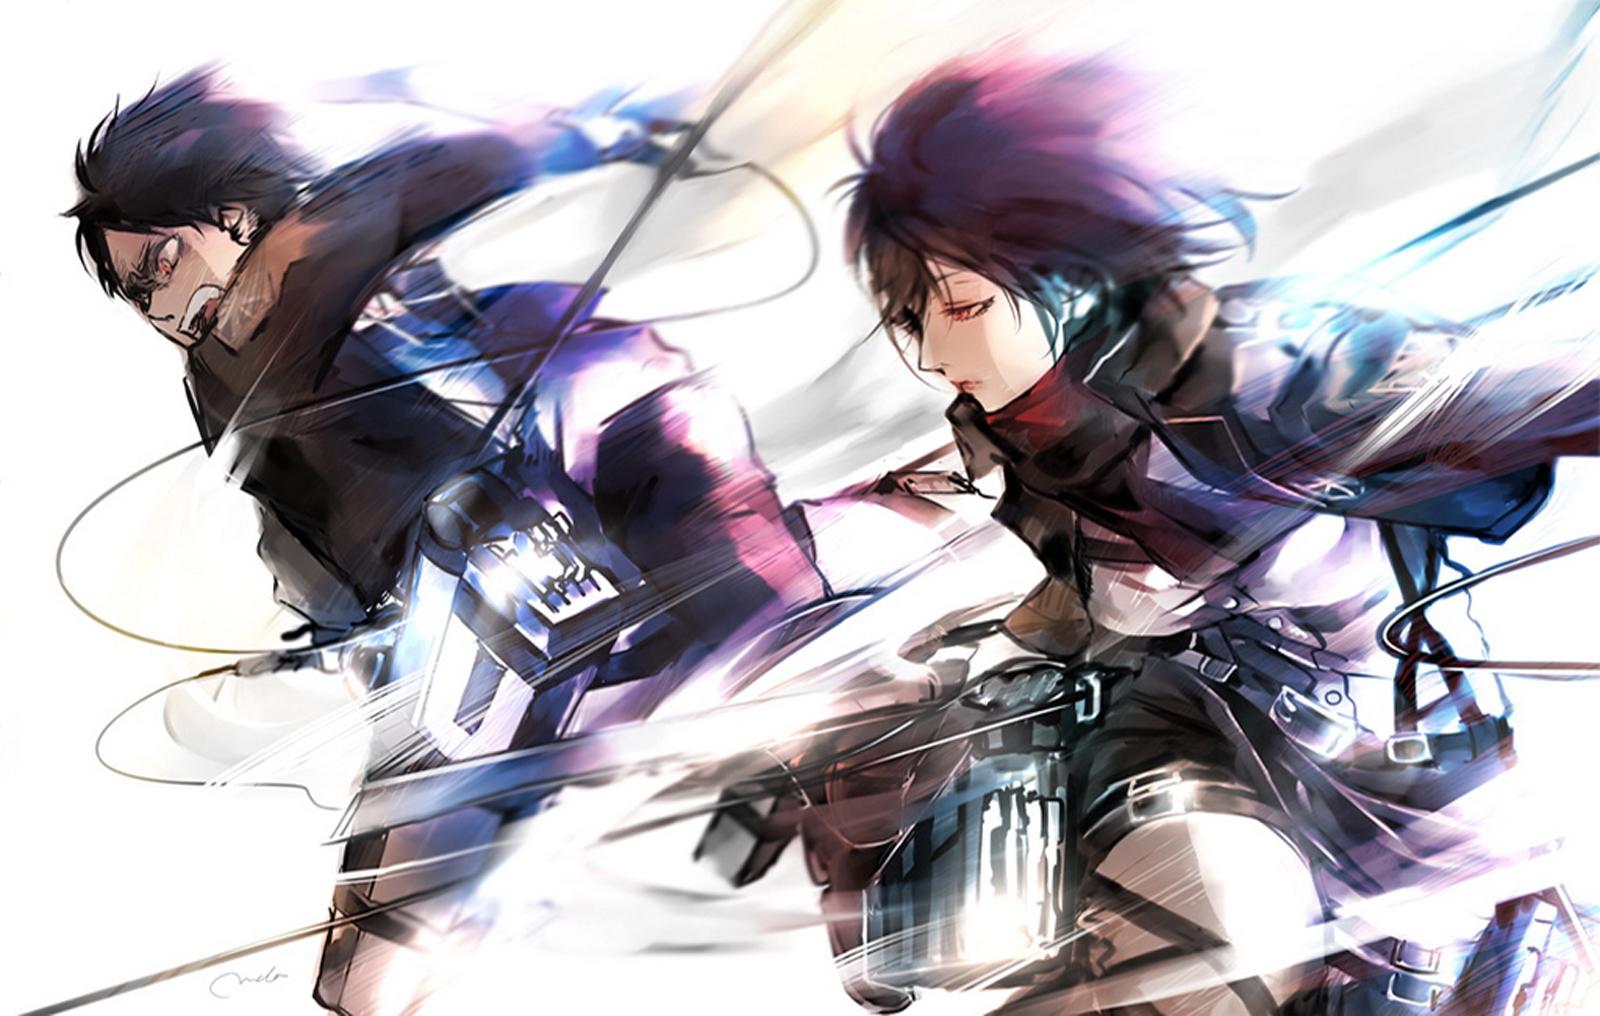 Shingeki no Kyojin Attack on titan AOT Wallpapers 1600x1016